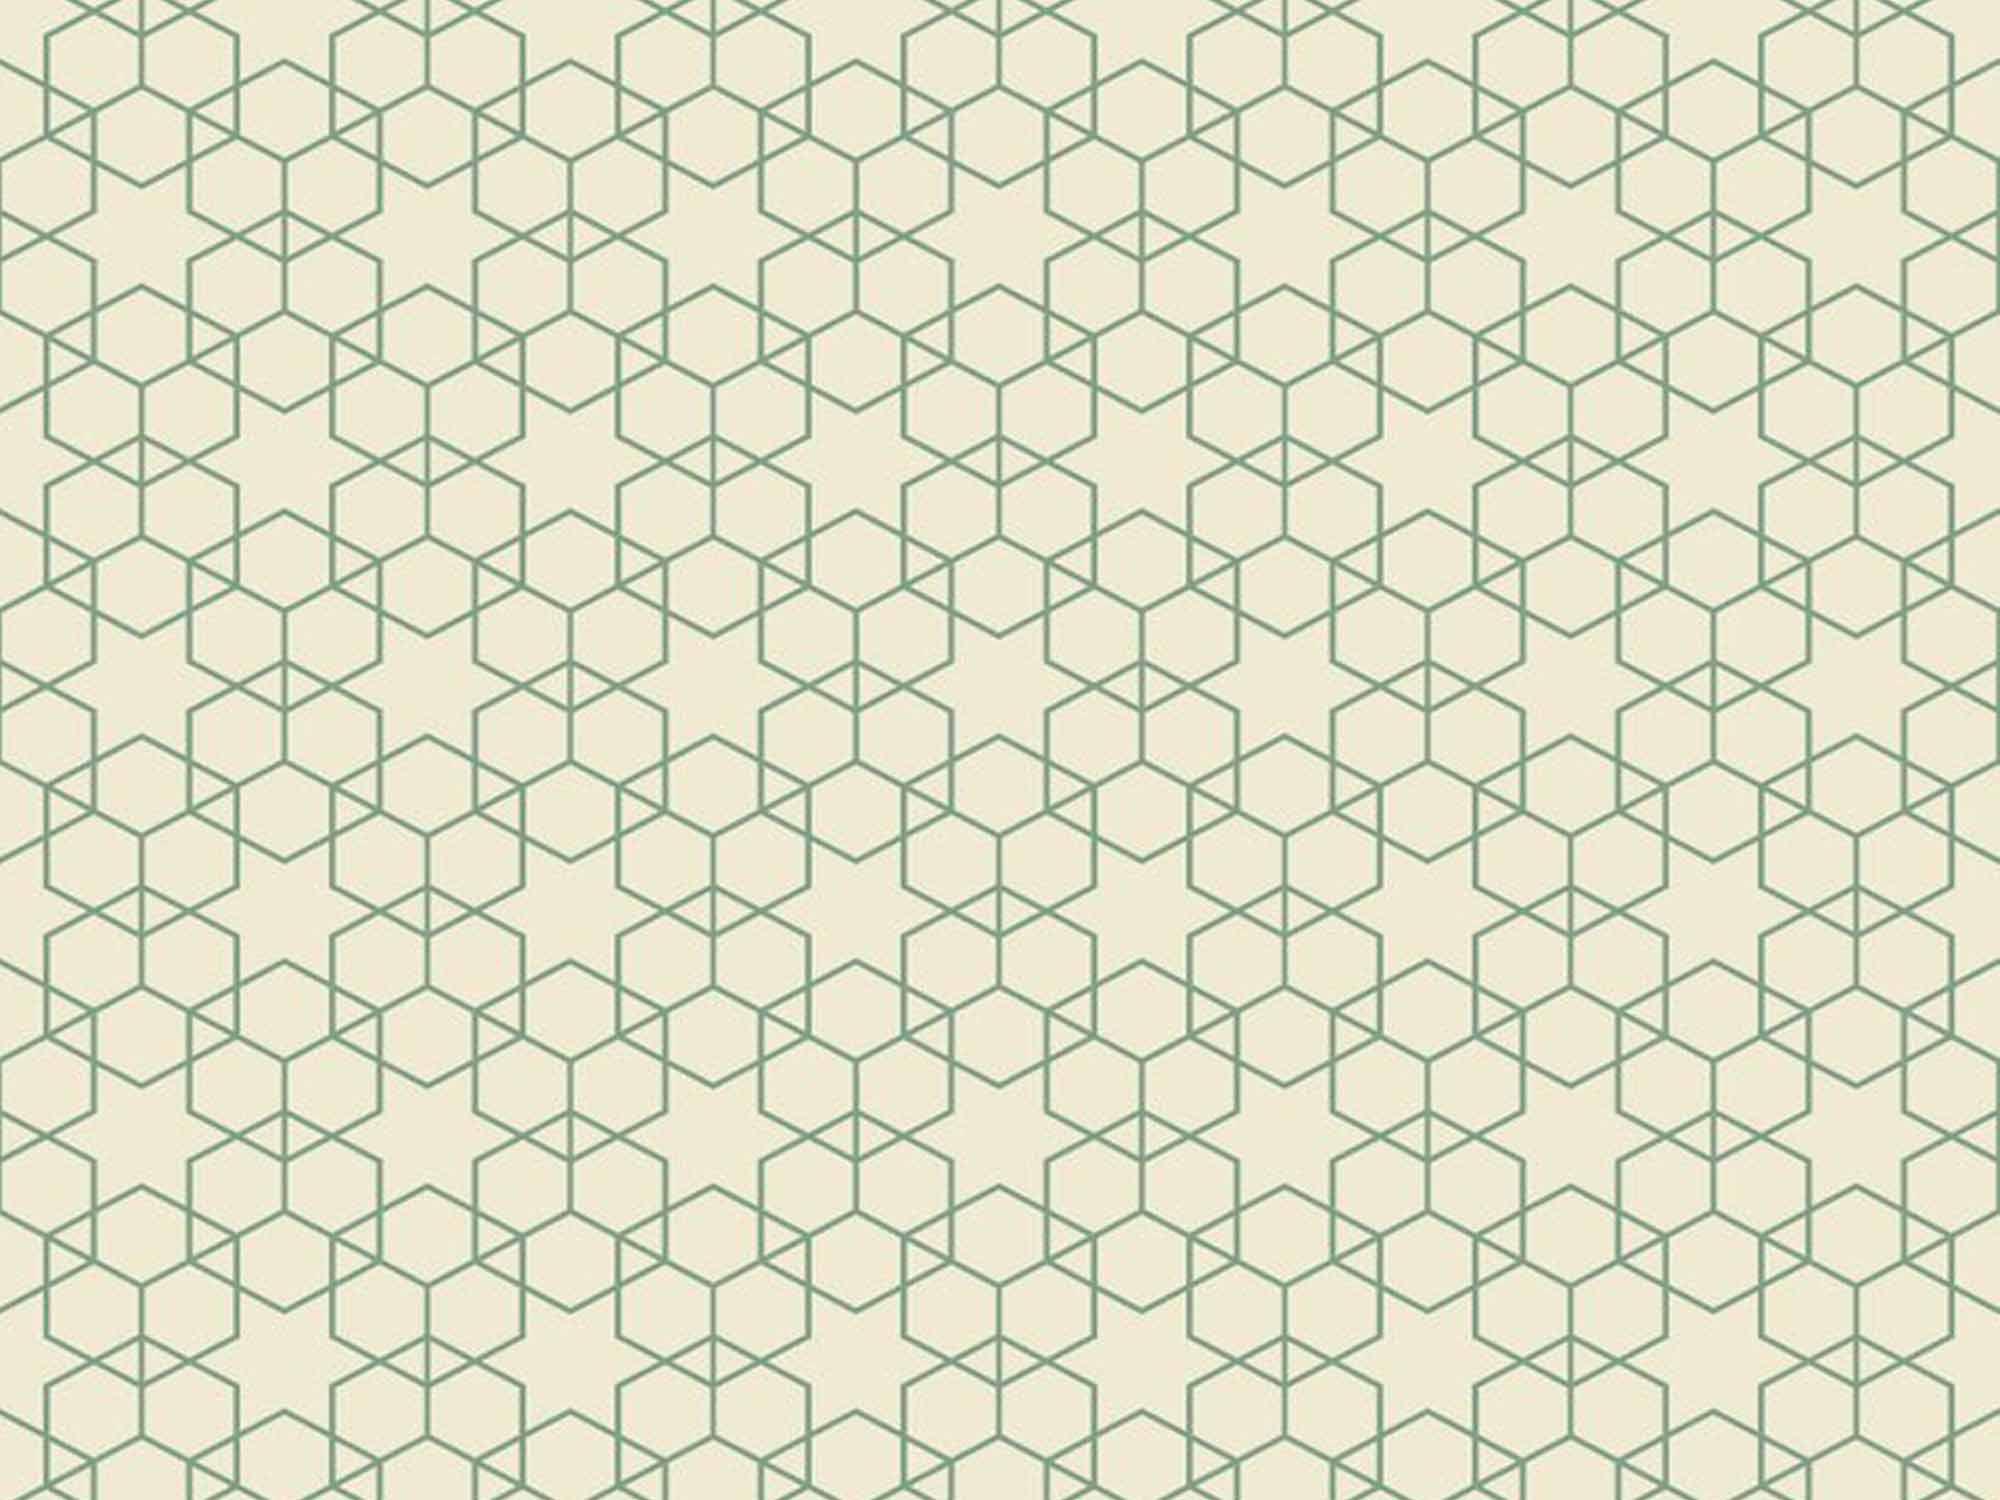 Papel de Parede para Sala Geométrico 0076 - Adesivos de Parede  - Paredes Decoradas